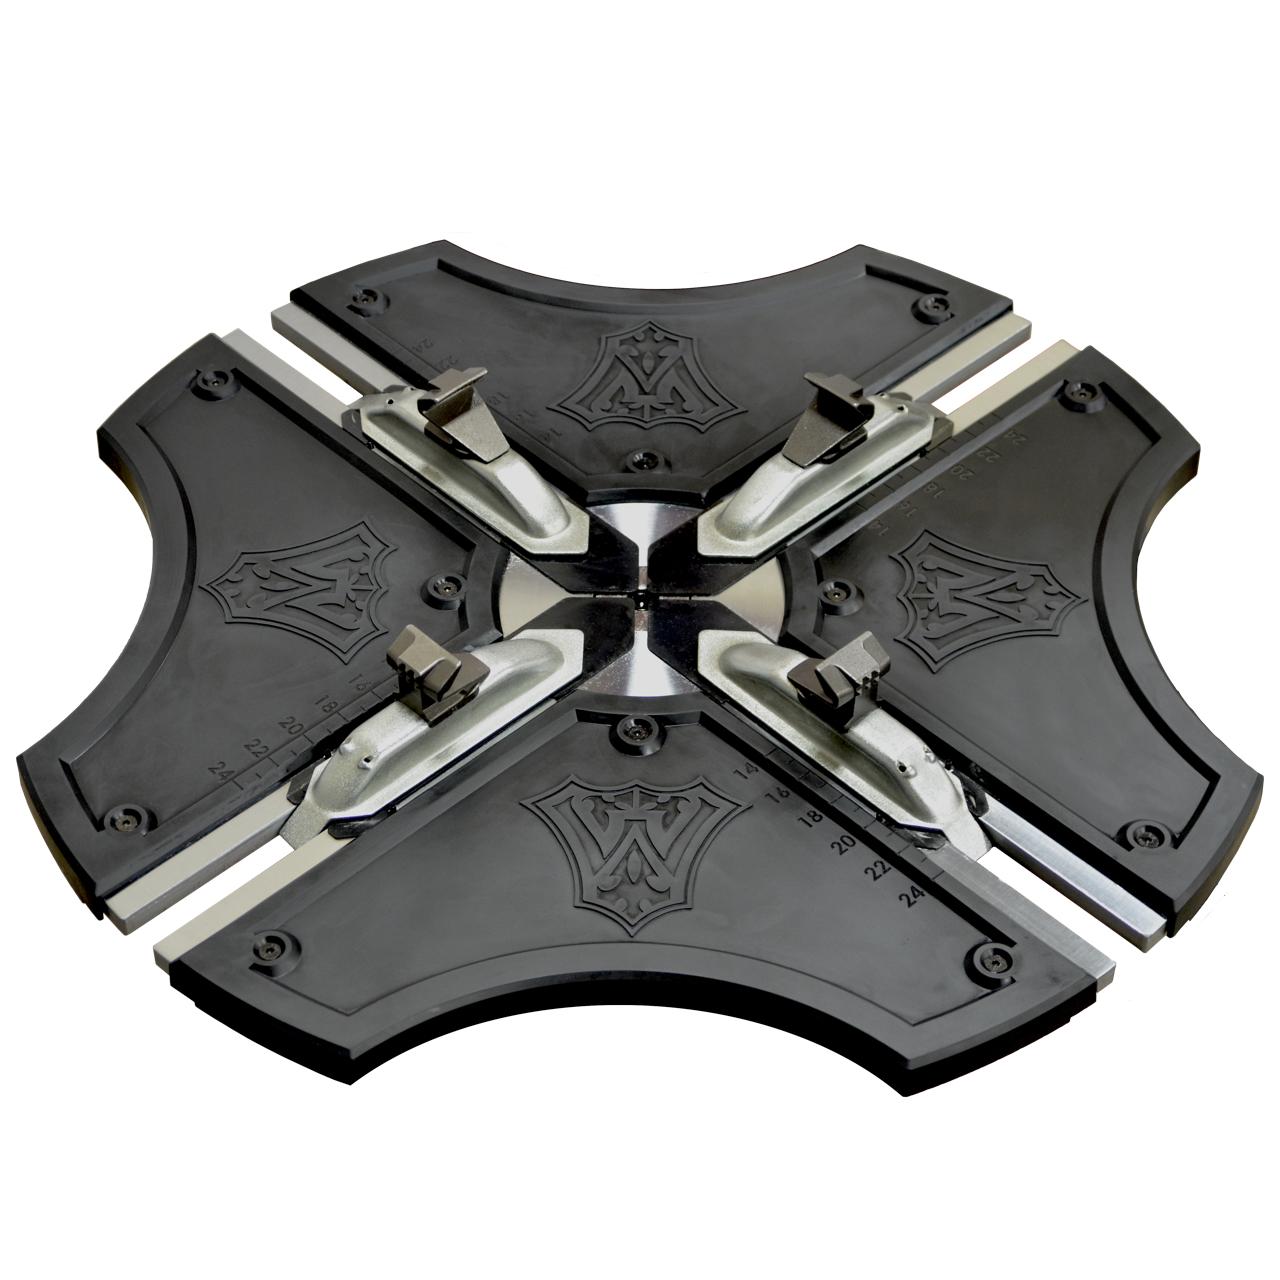 W-894XS BLACK ARMOUR™ Turntable Plastic Wheel Protection